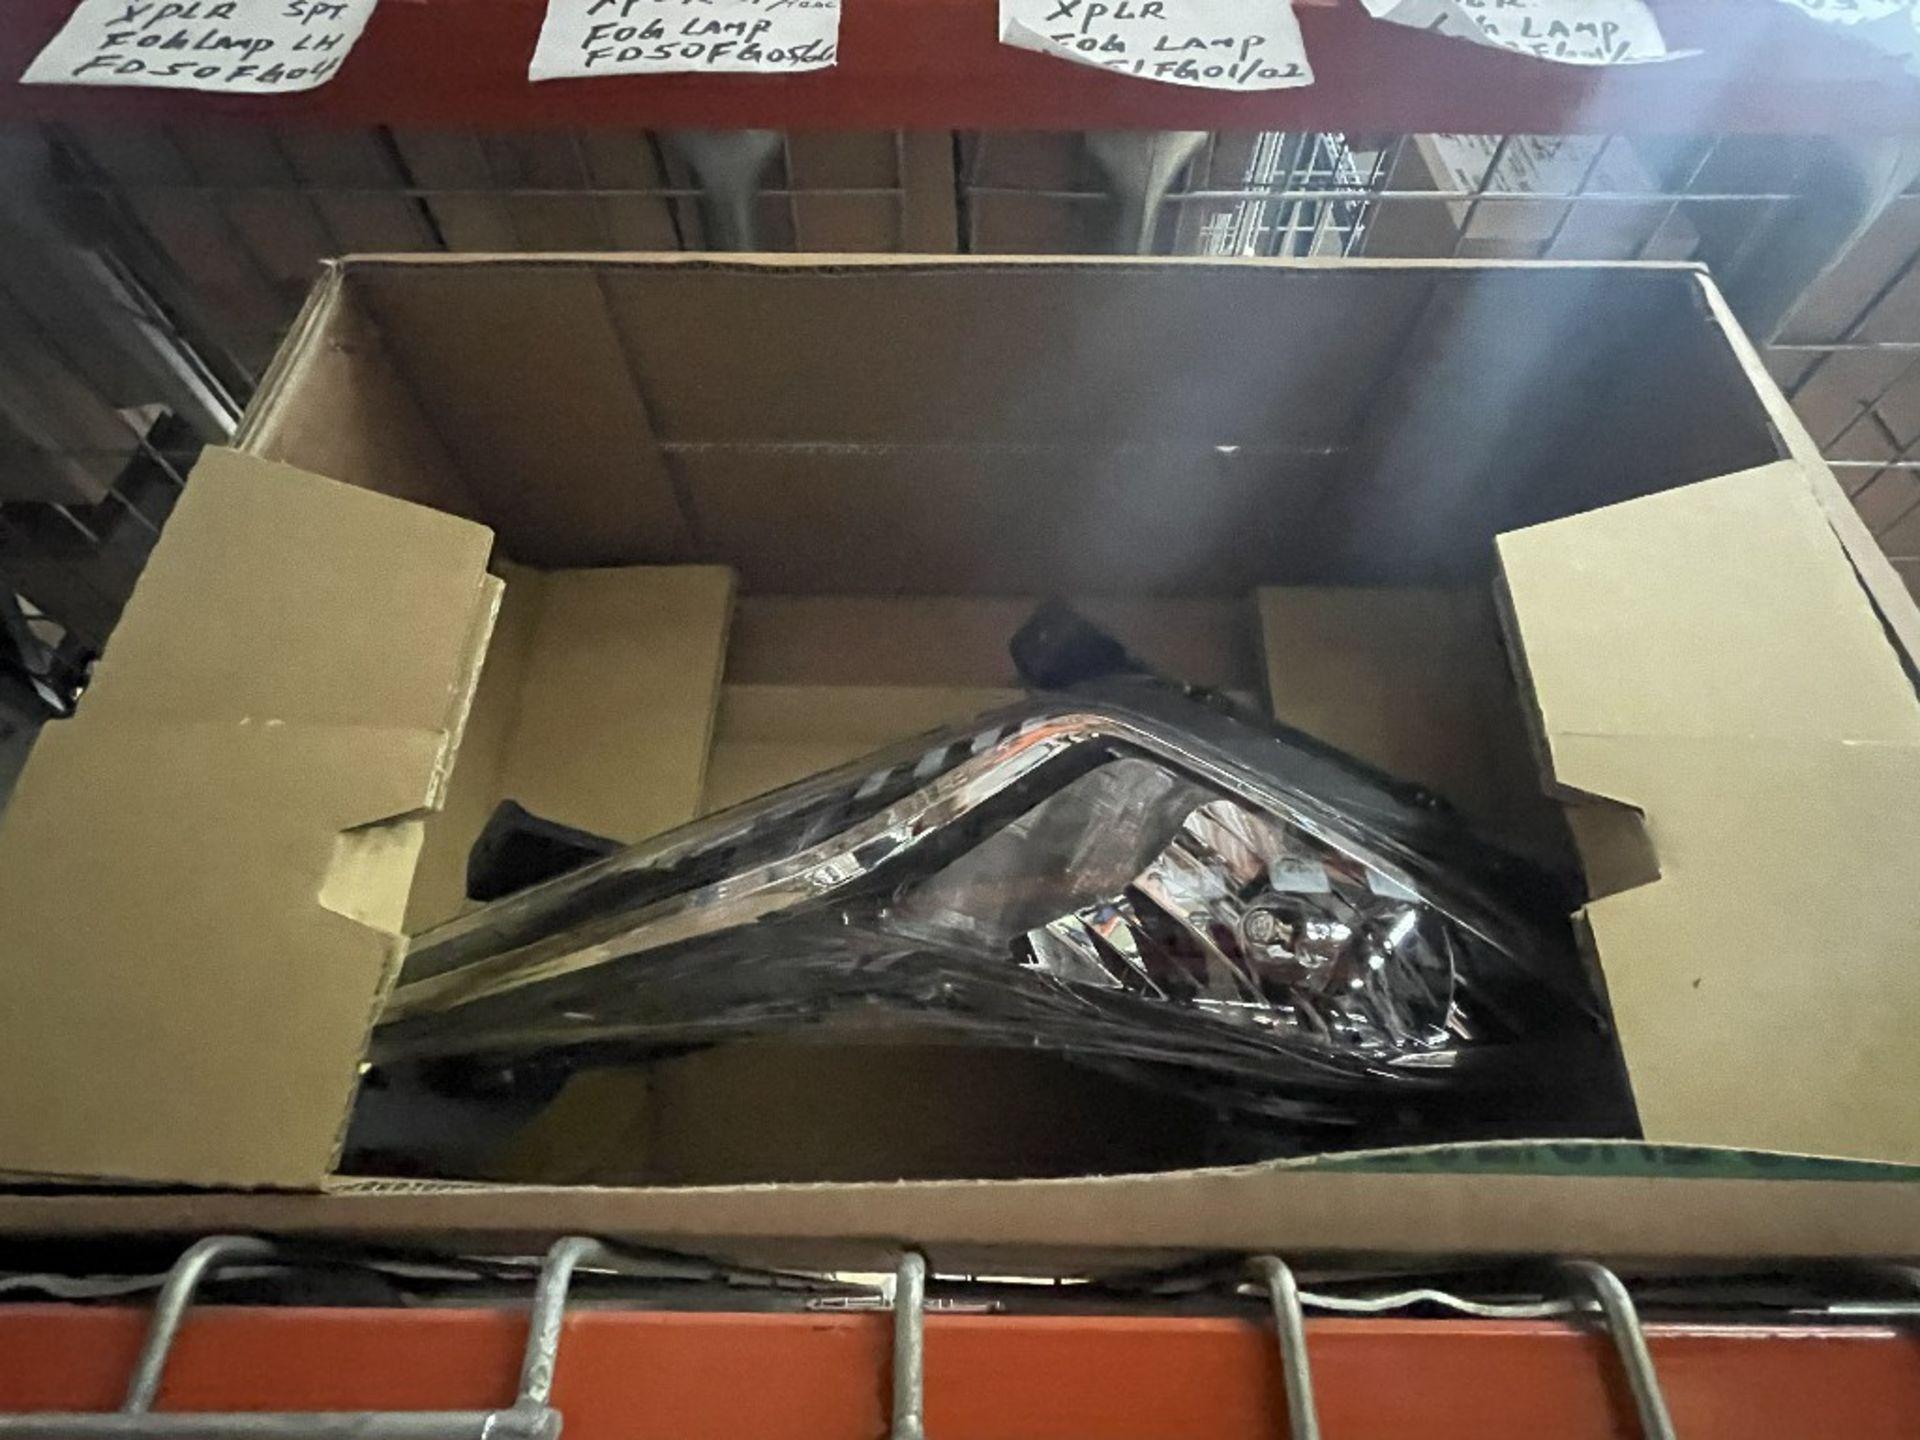 ASST EAGLE DEPOT TYC FOG LAMPS INTEGRA 4 RUNNER - Image 2 of 3